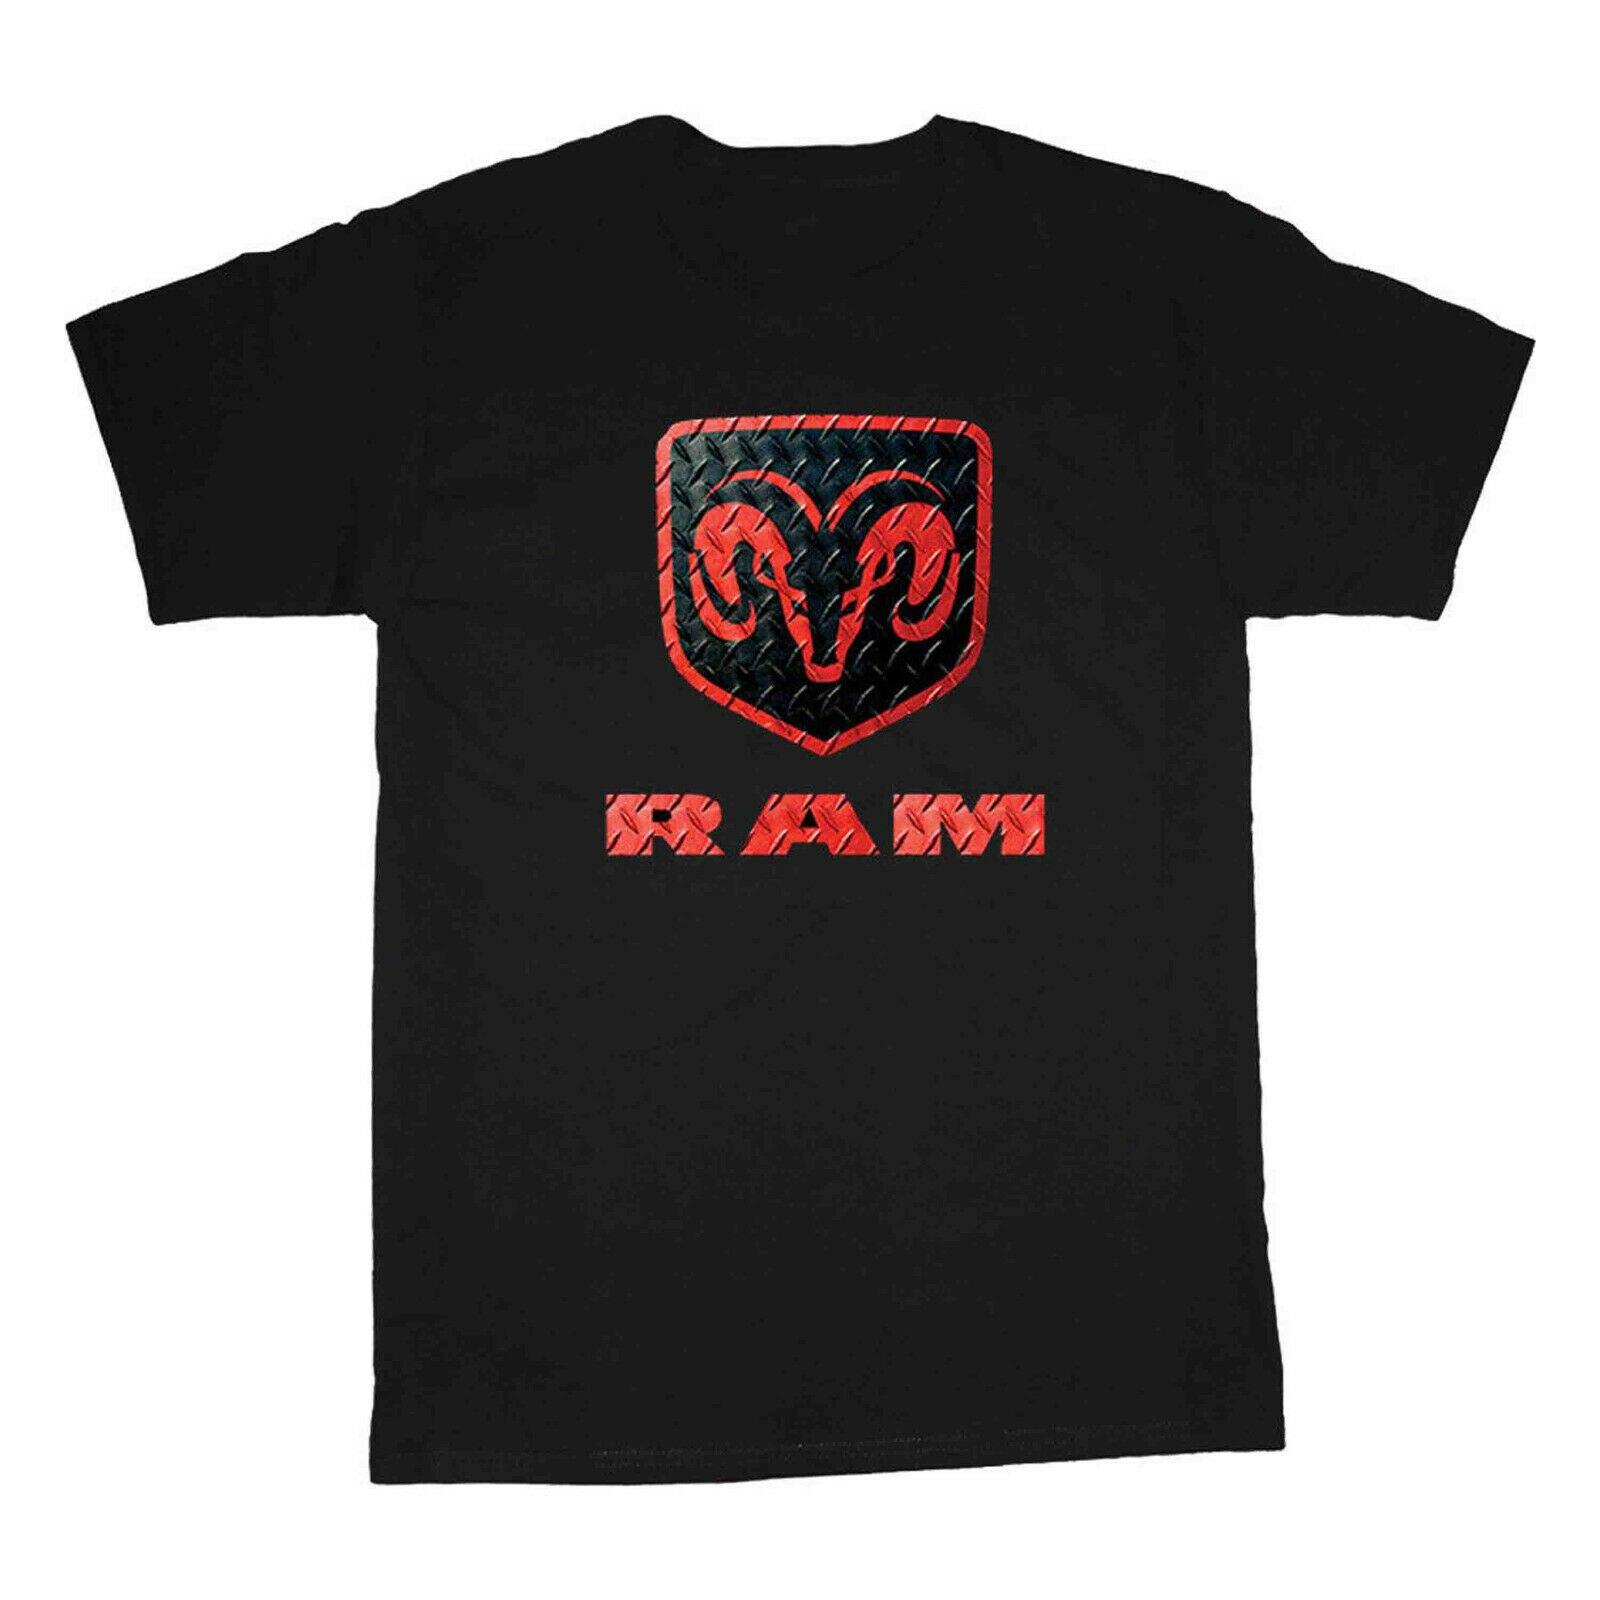 Camiseta Dodge Ram para hombre, camisetas con Logo de Ram para hombre, ropa Dodge